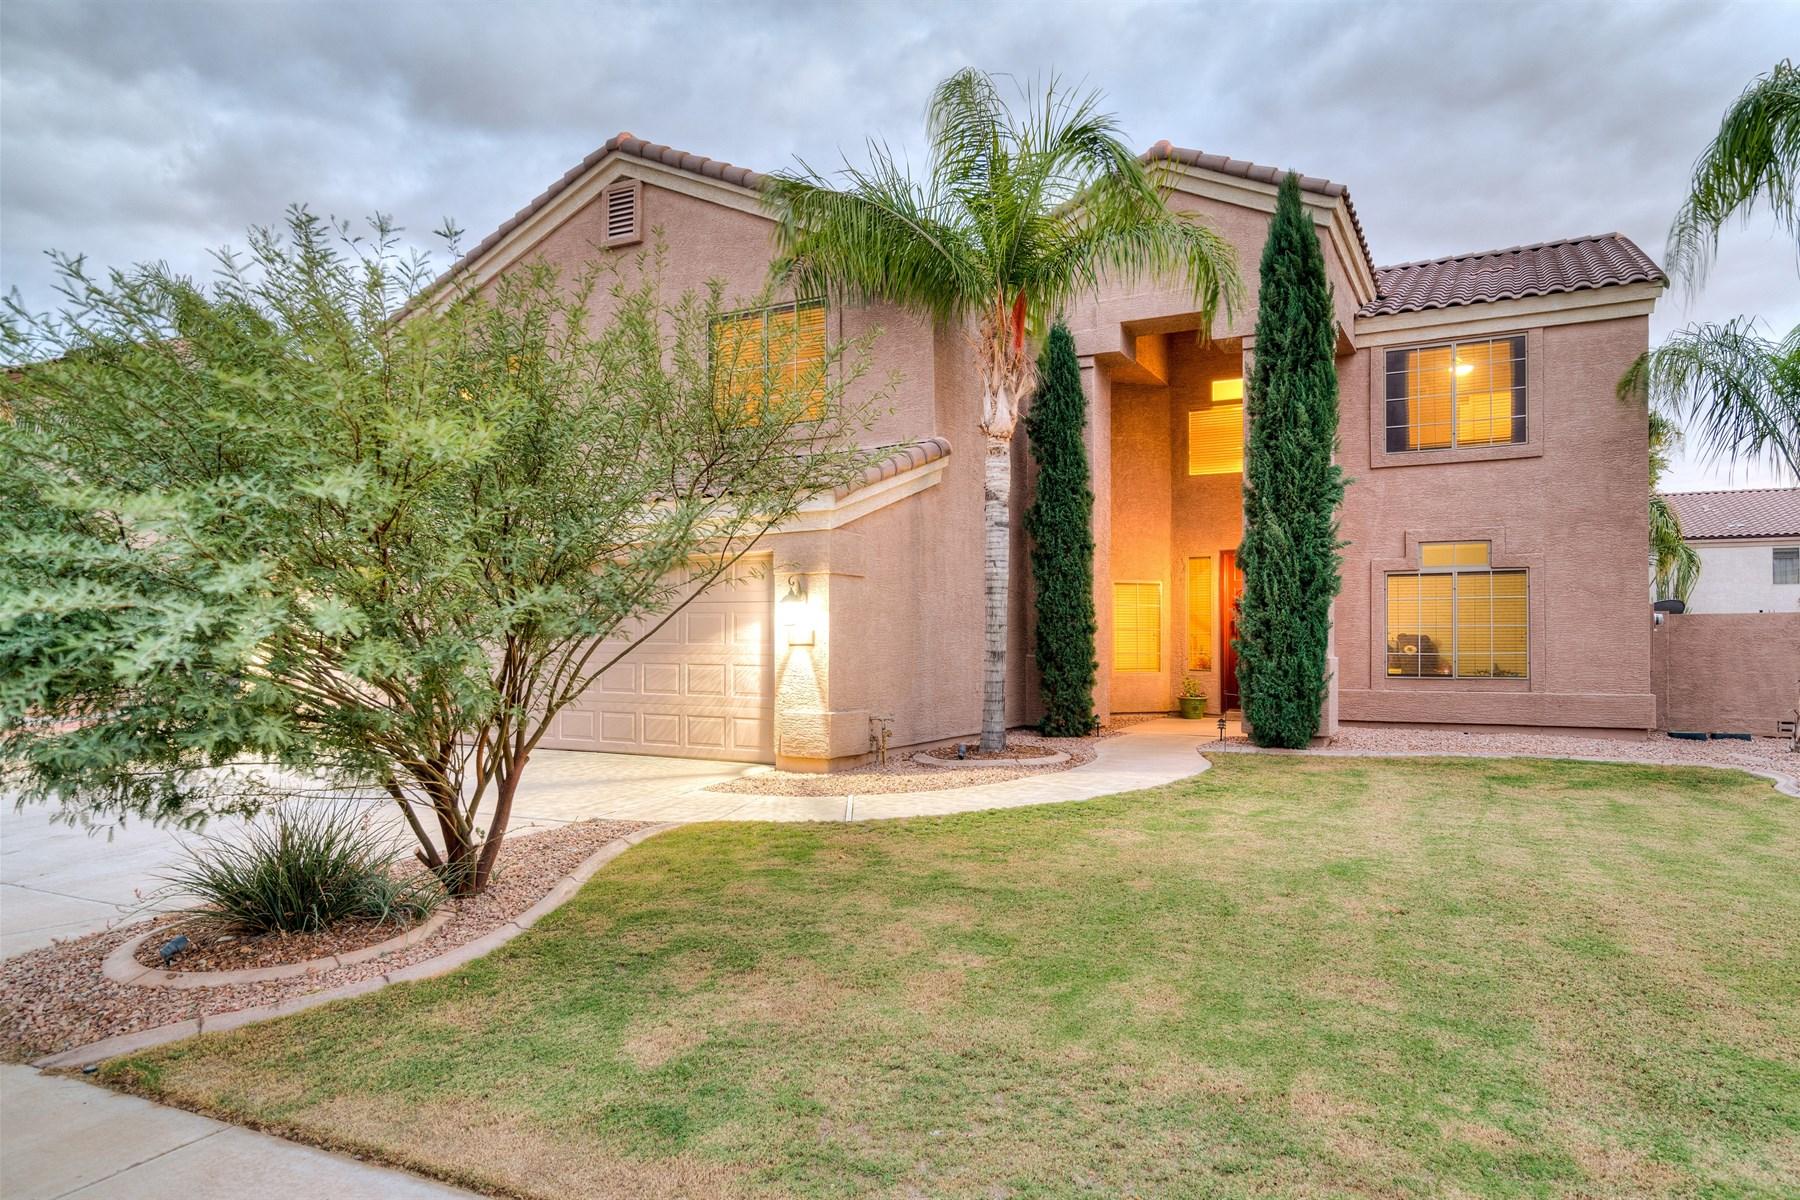 獨棟家庭住宅 為 出售 在 Beautiful home in Augusta Ranch 9545 E Lompoc Ave Mesa, 亞利桑那州 85209 美國